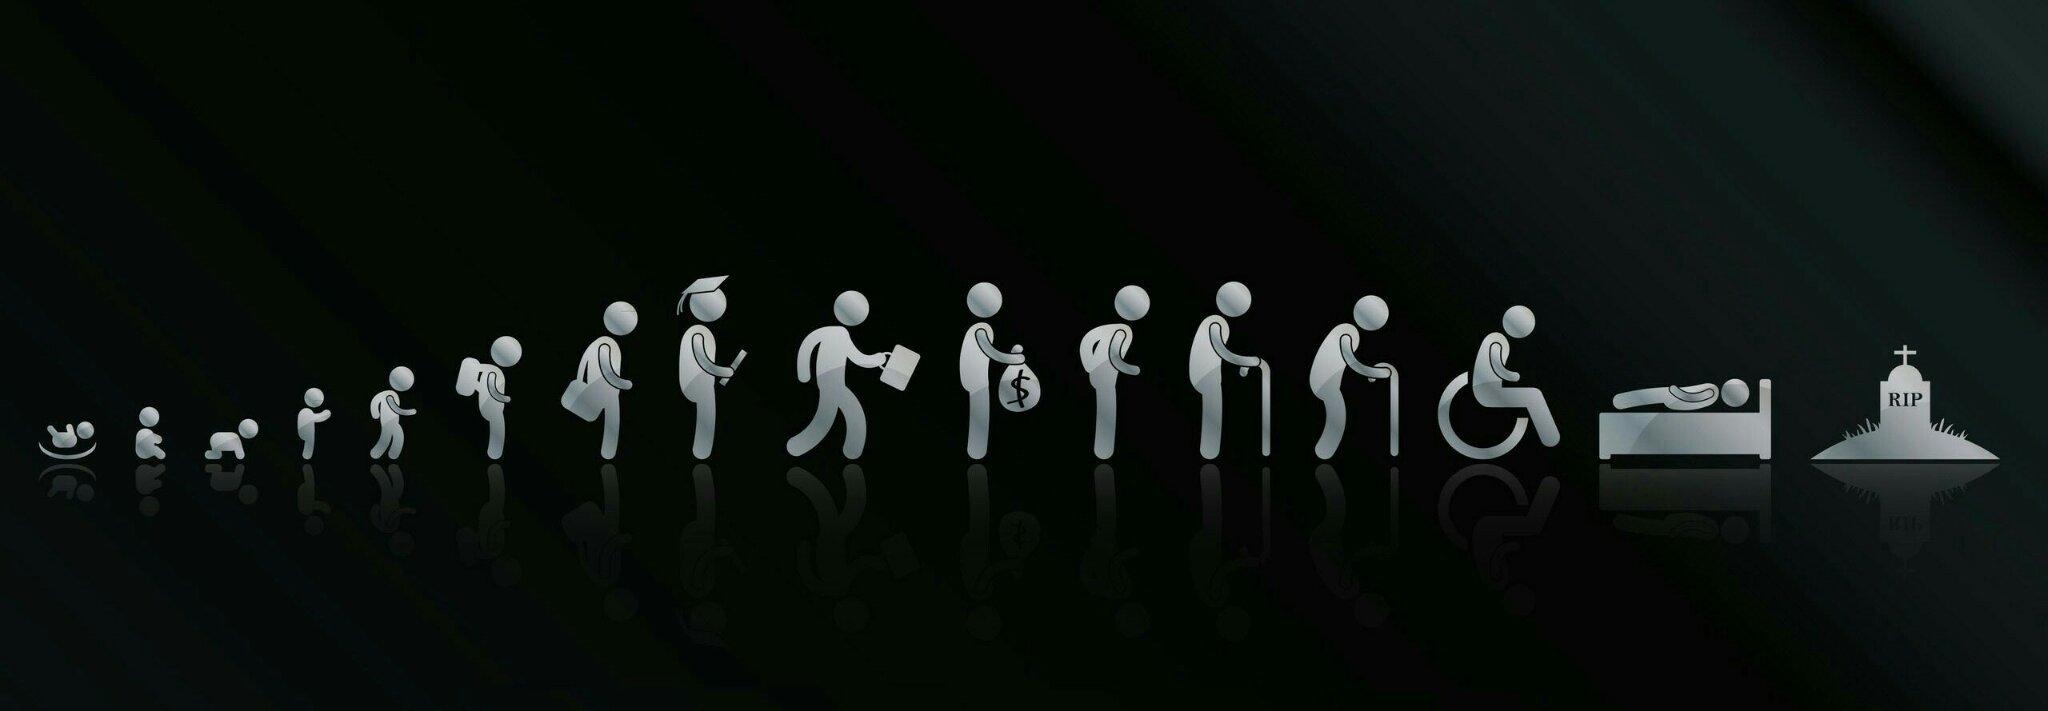 Human life cycle - meme